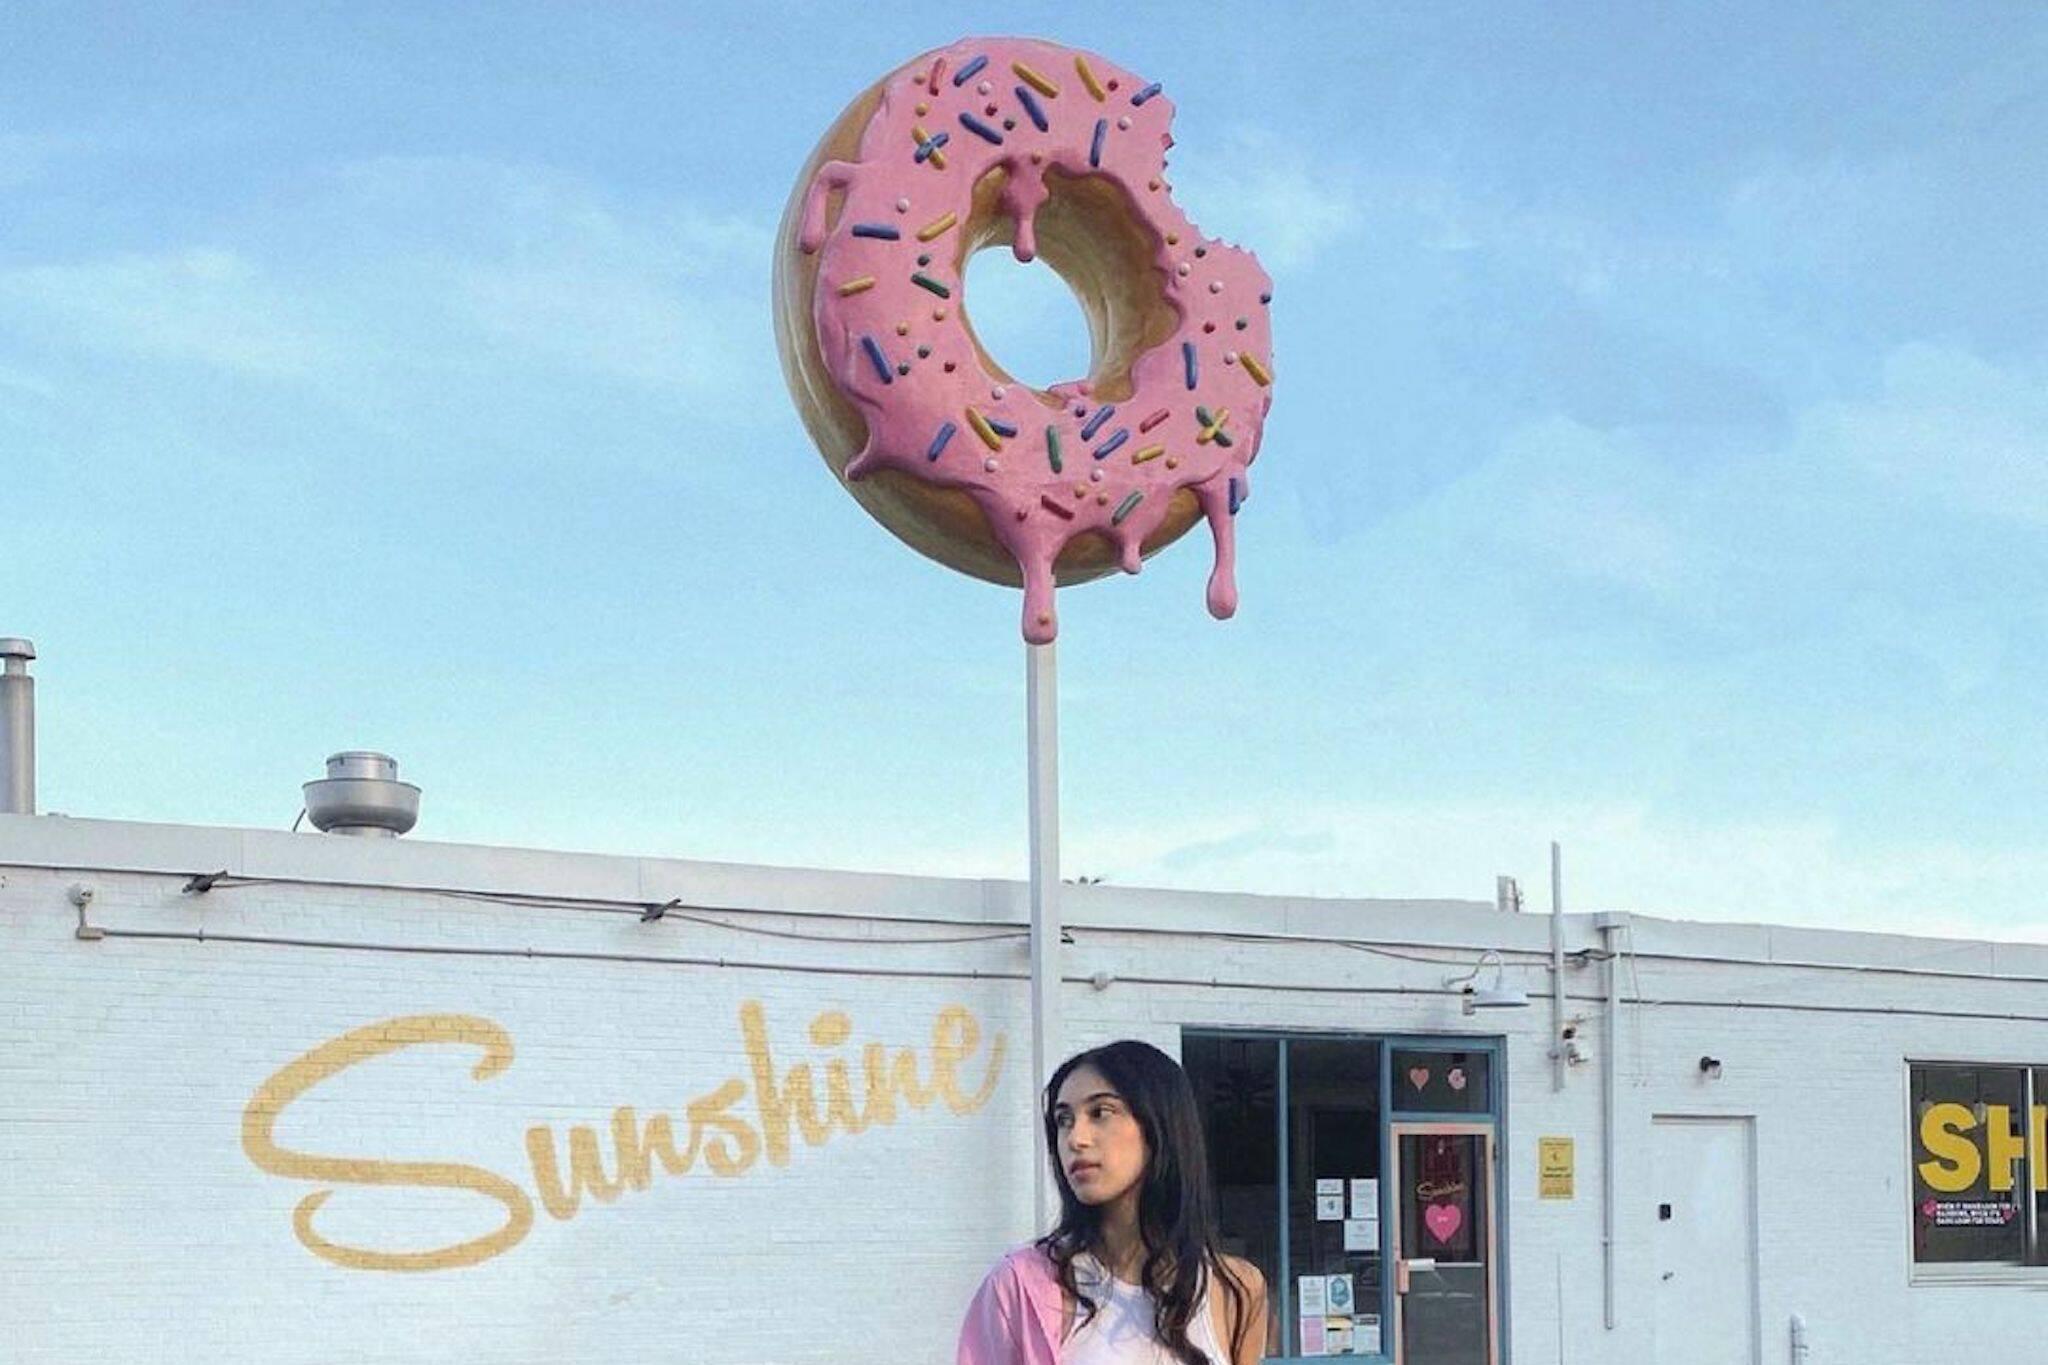 sunshine doughnuts ontario